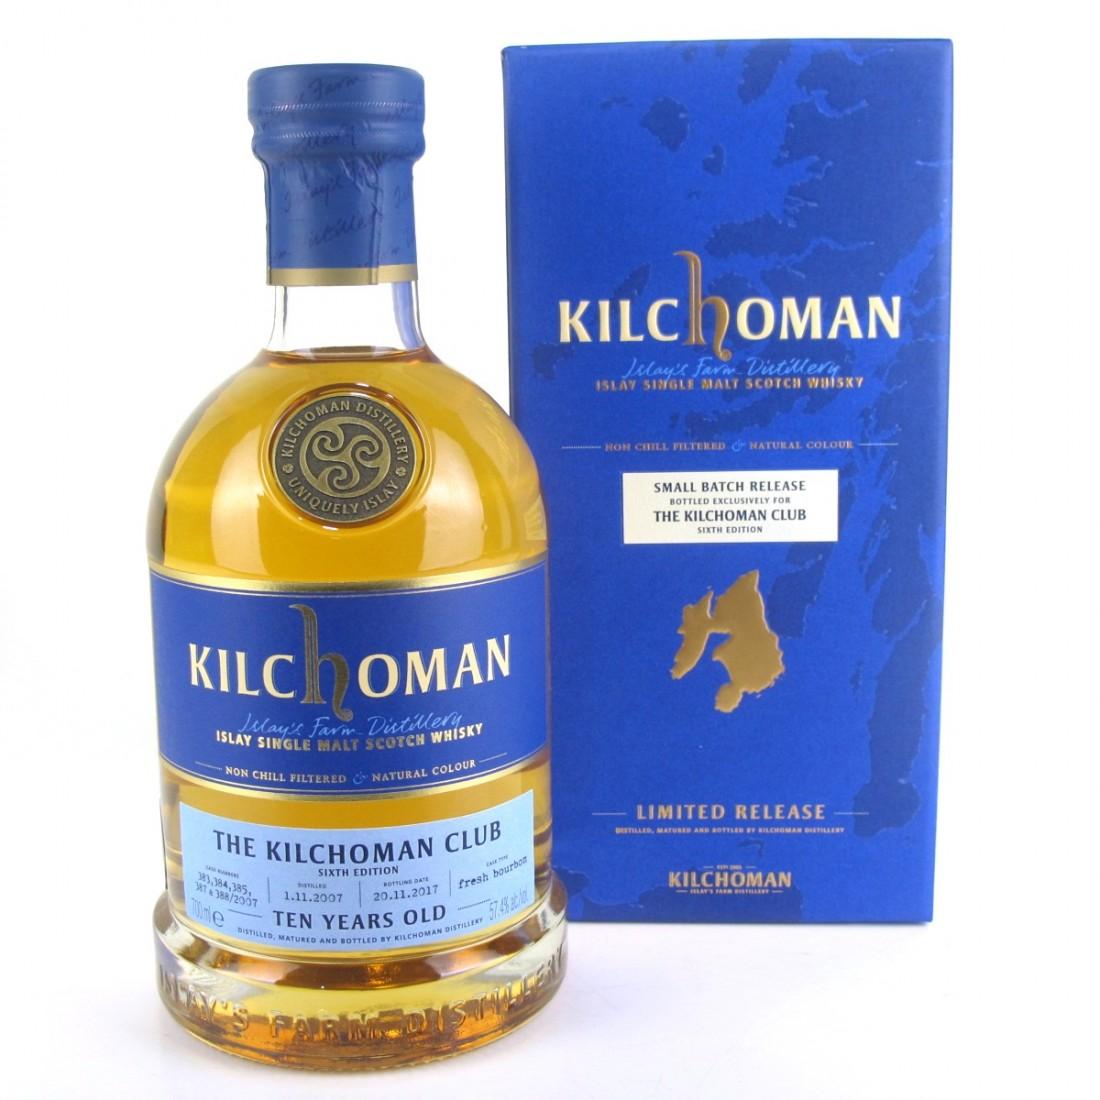 Kilchoman 10 Year Old / Kilchoman Club 6th Edition